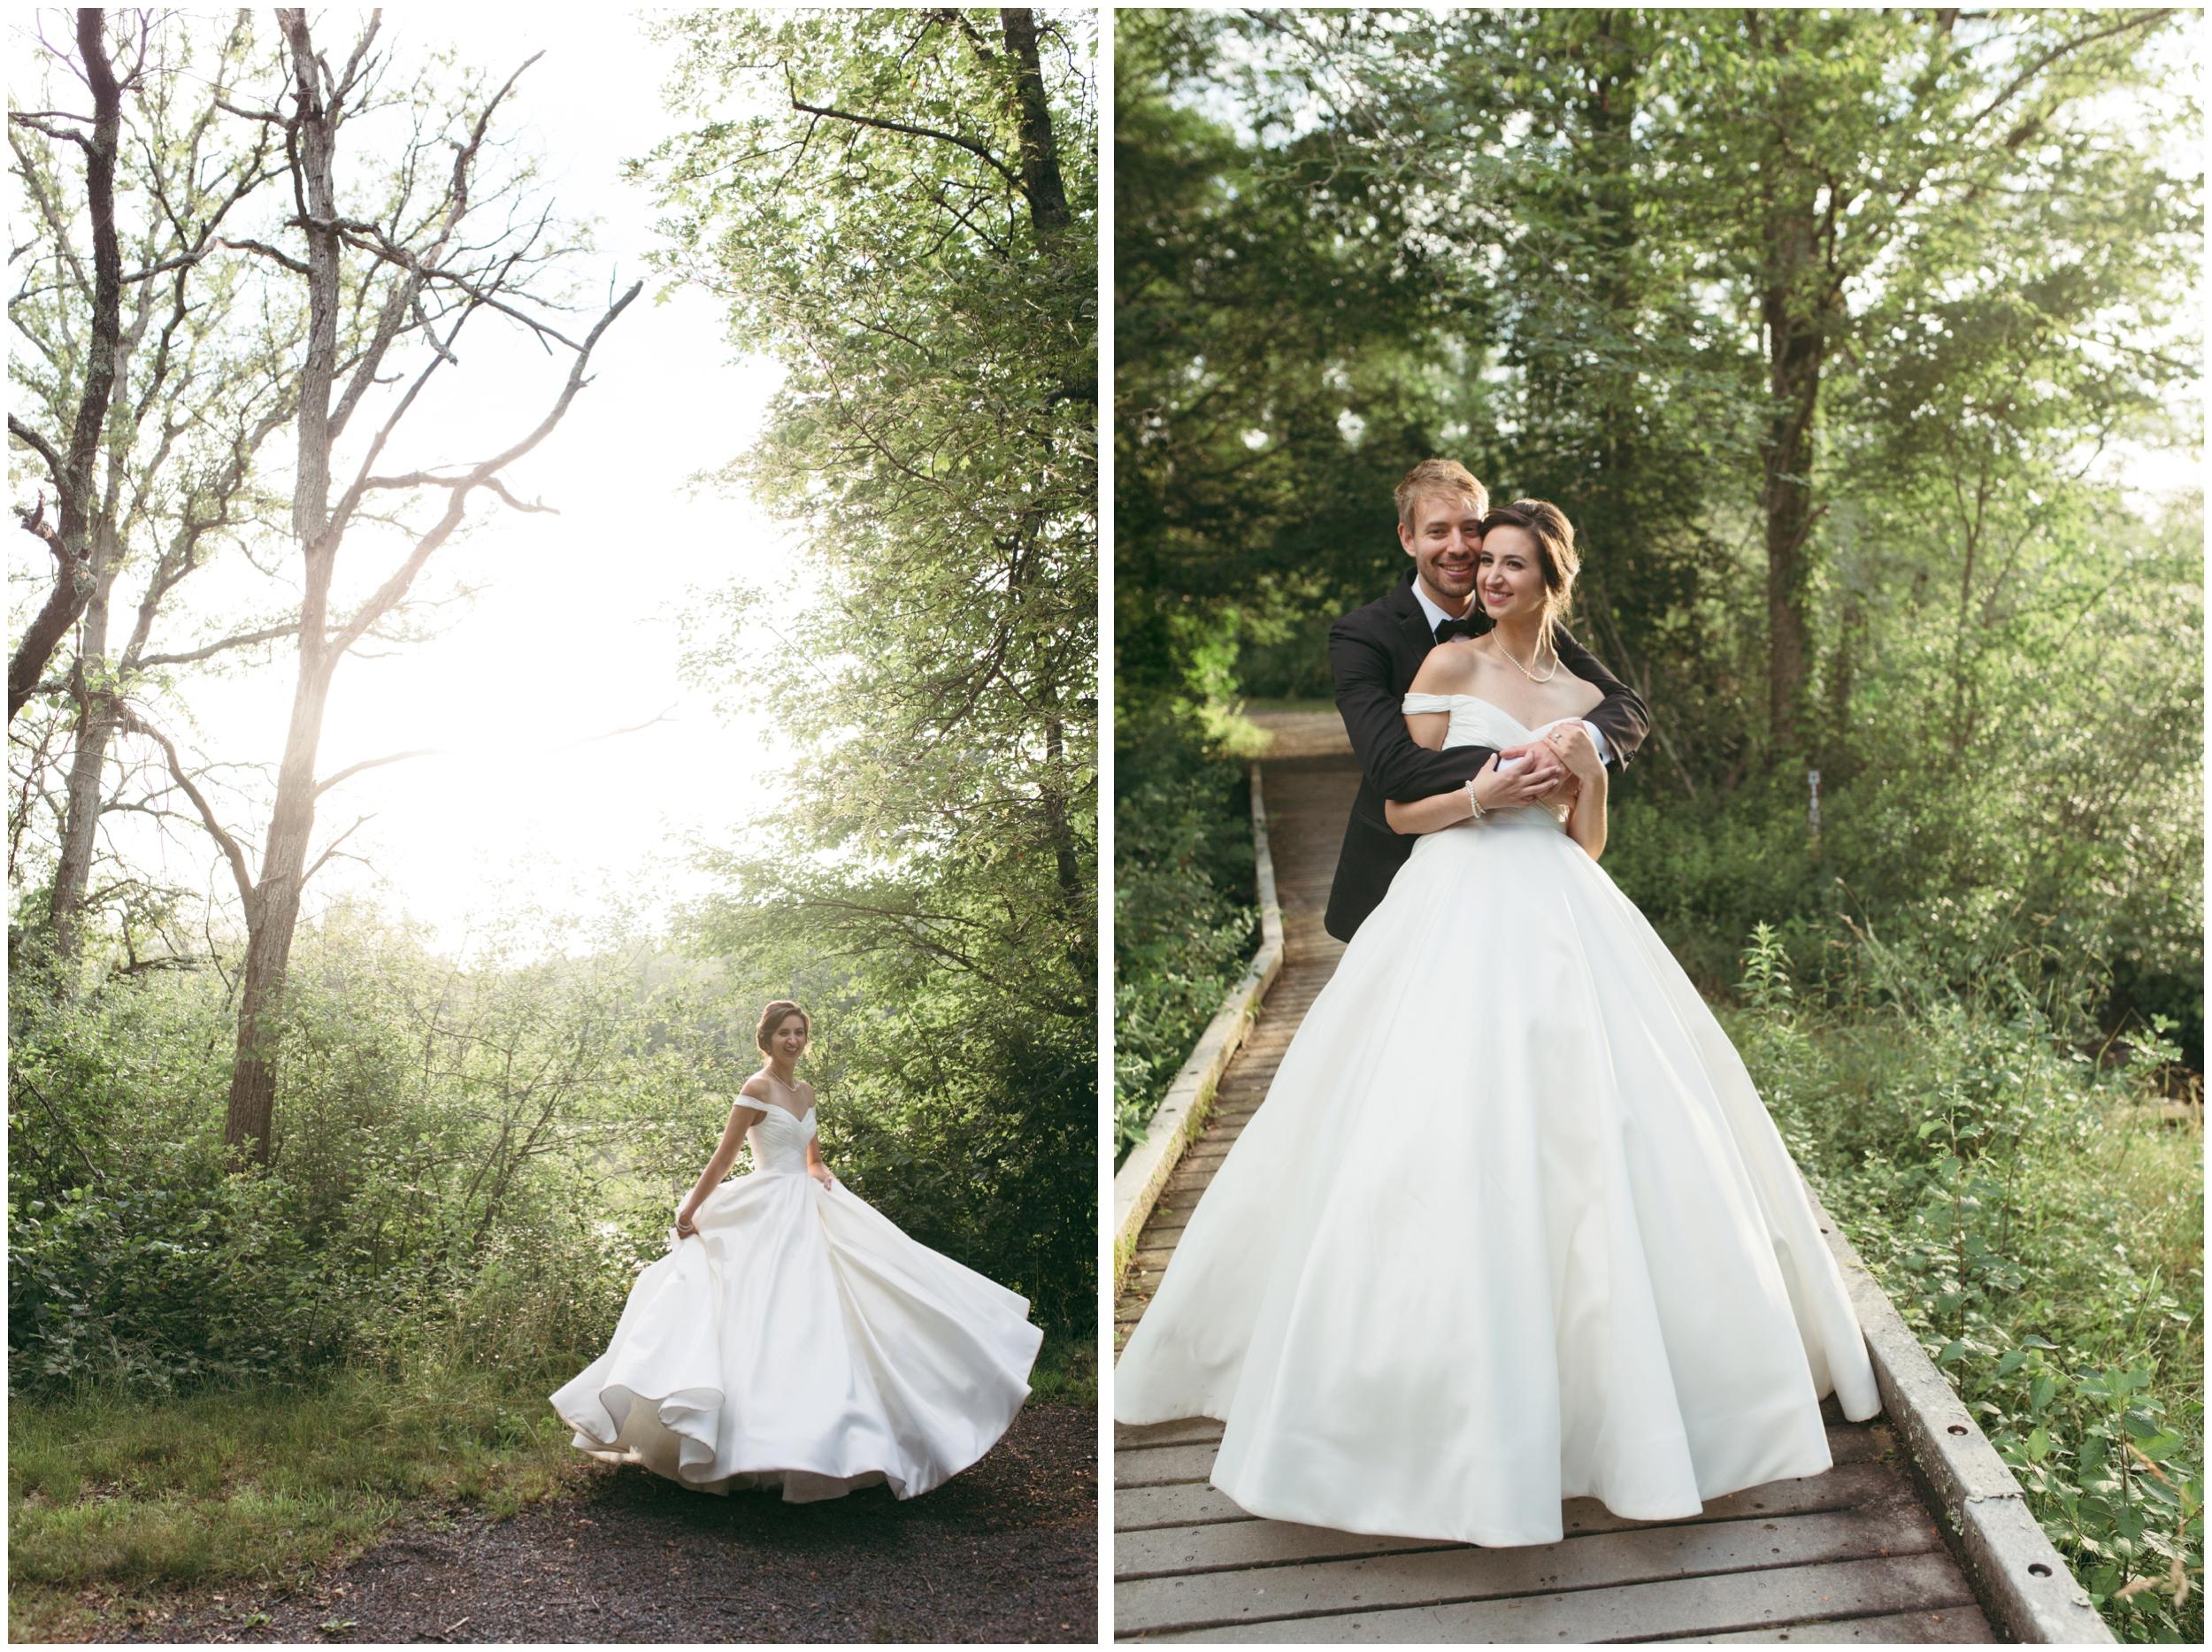 Willowdale-Estate-Wedding-Bailey-Q-Photo-Boston-Wedding-Photographer-064.JPG